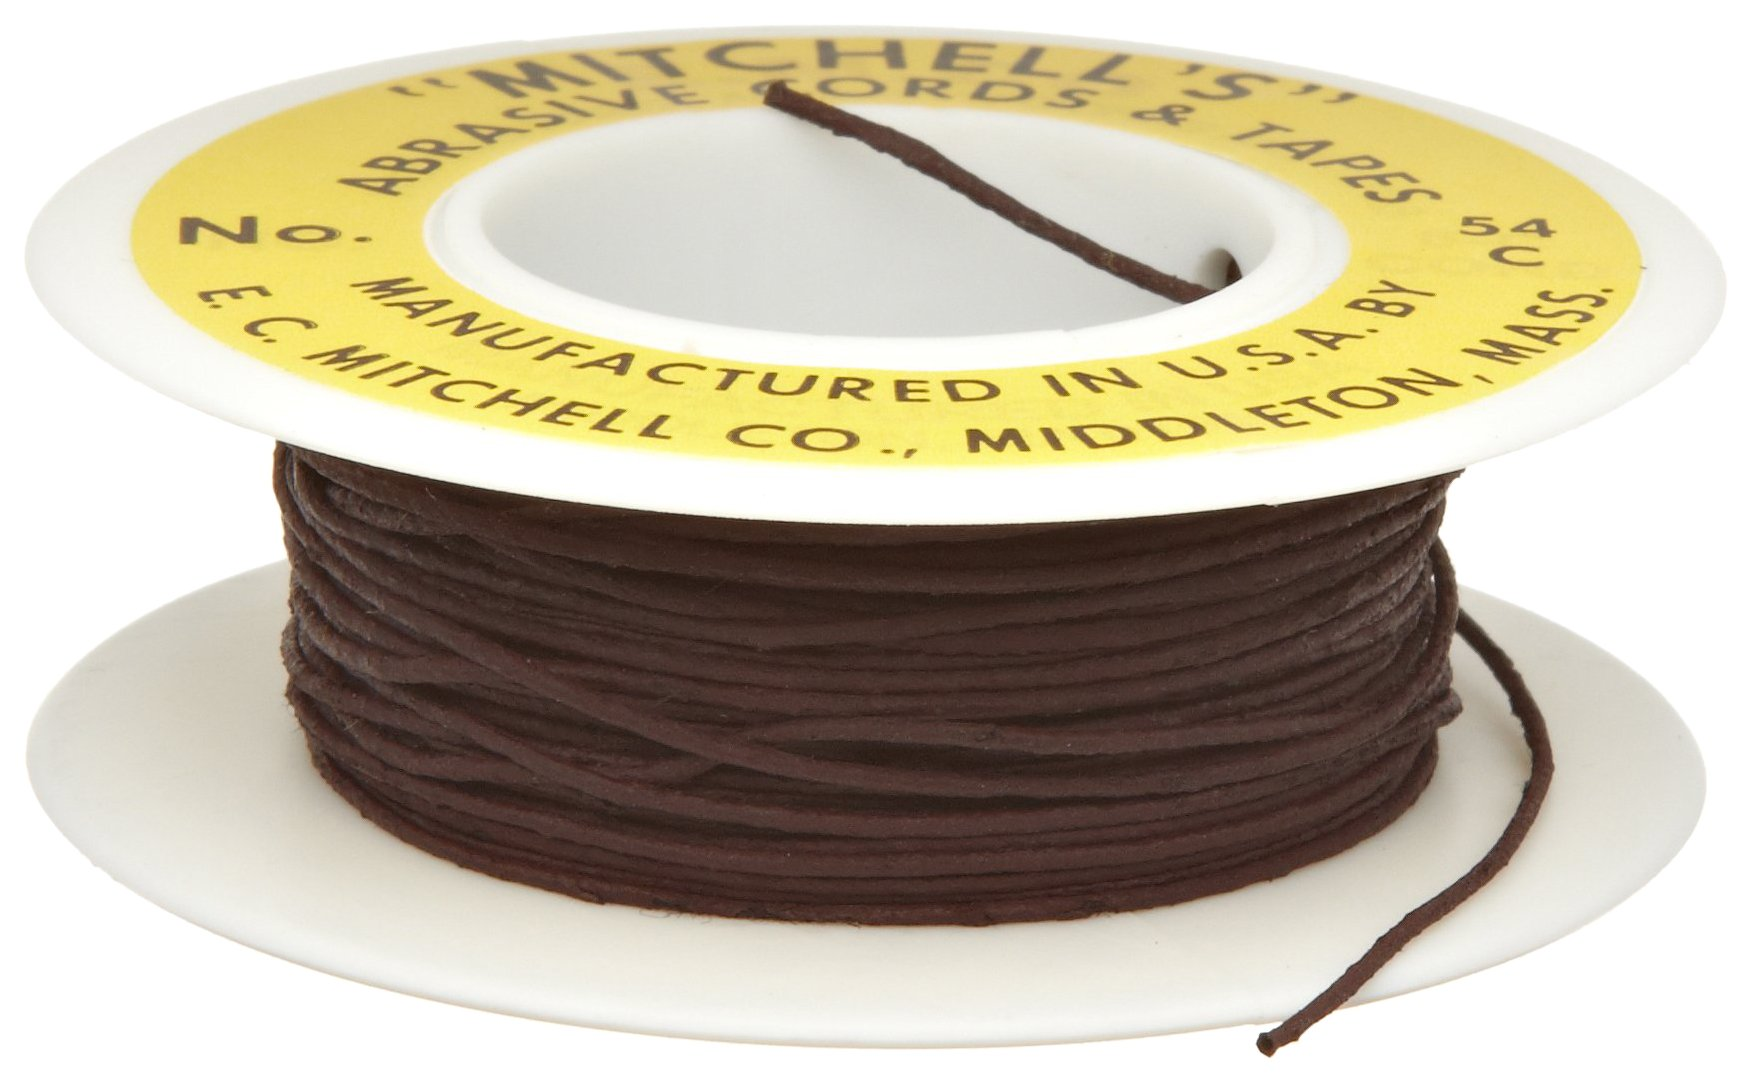 Mitchell Abrasives 54-C Round Crocus Polishing Cord, .030'' Diameter x 25 Feet by Mitchell Abrasives